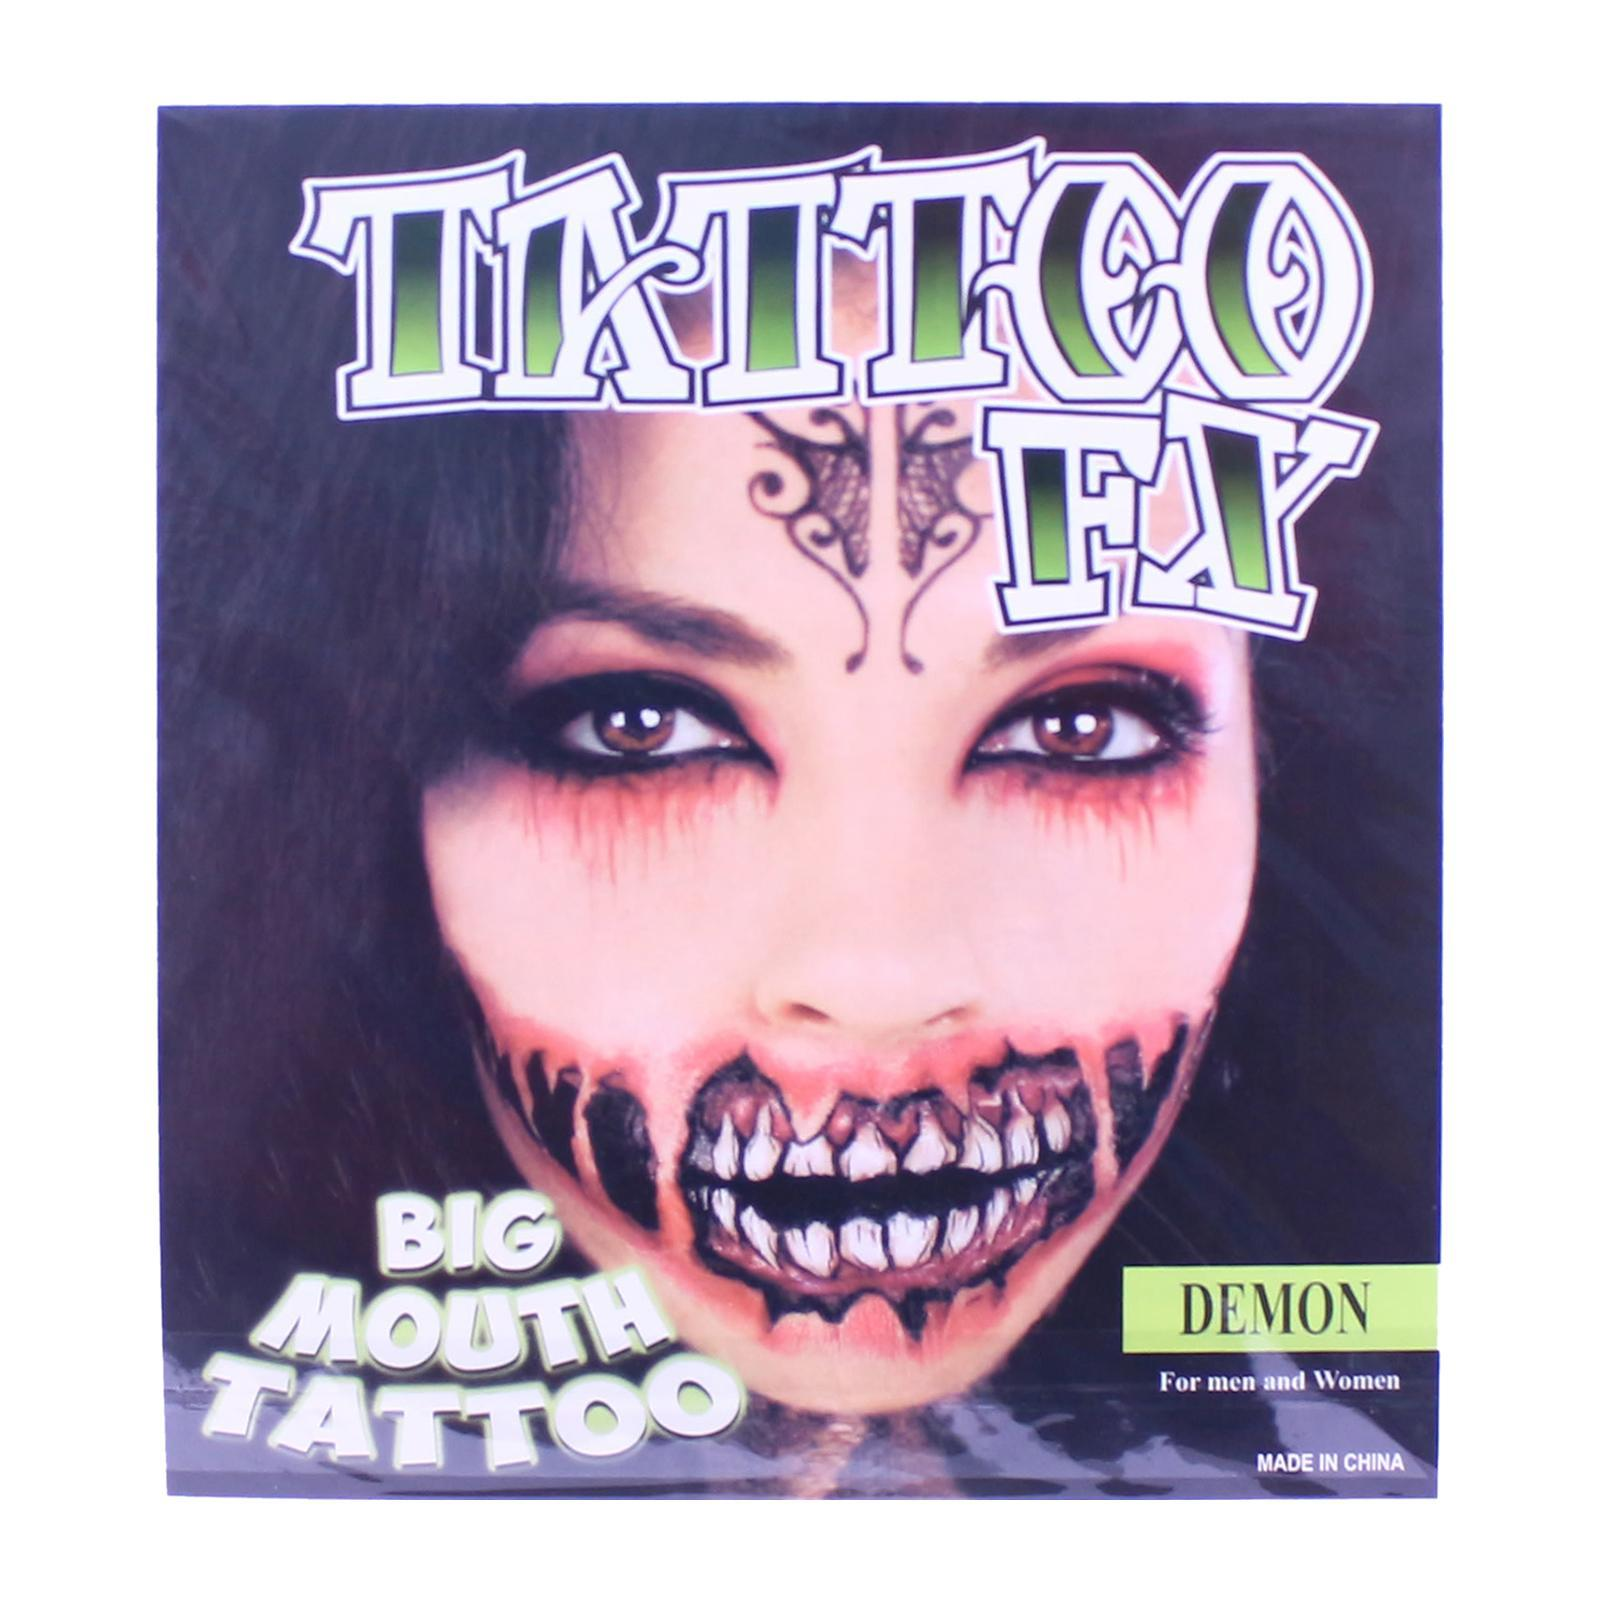 Partyforte Halloween Temporary Tattoo Body Tattoo Face Tattoo - Big Mouth